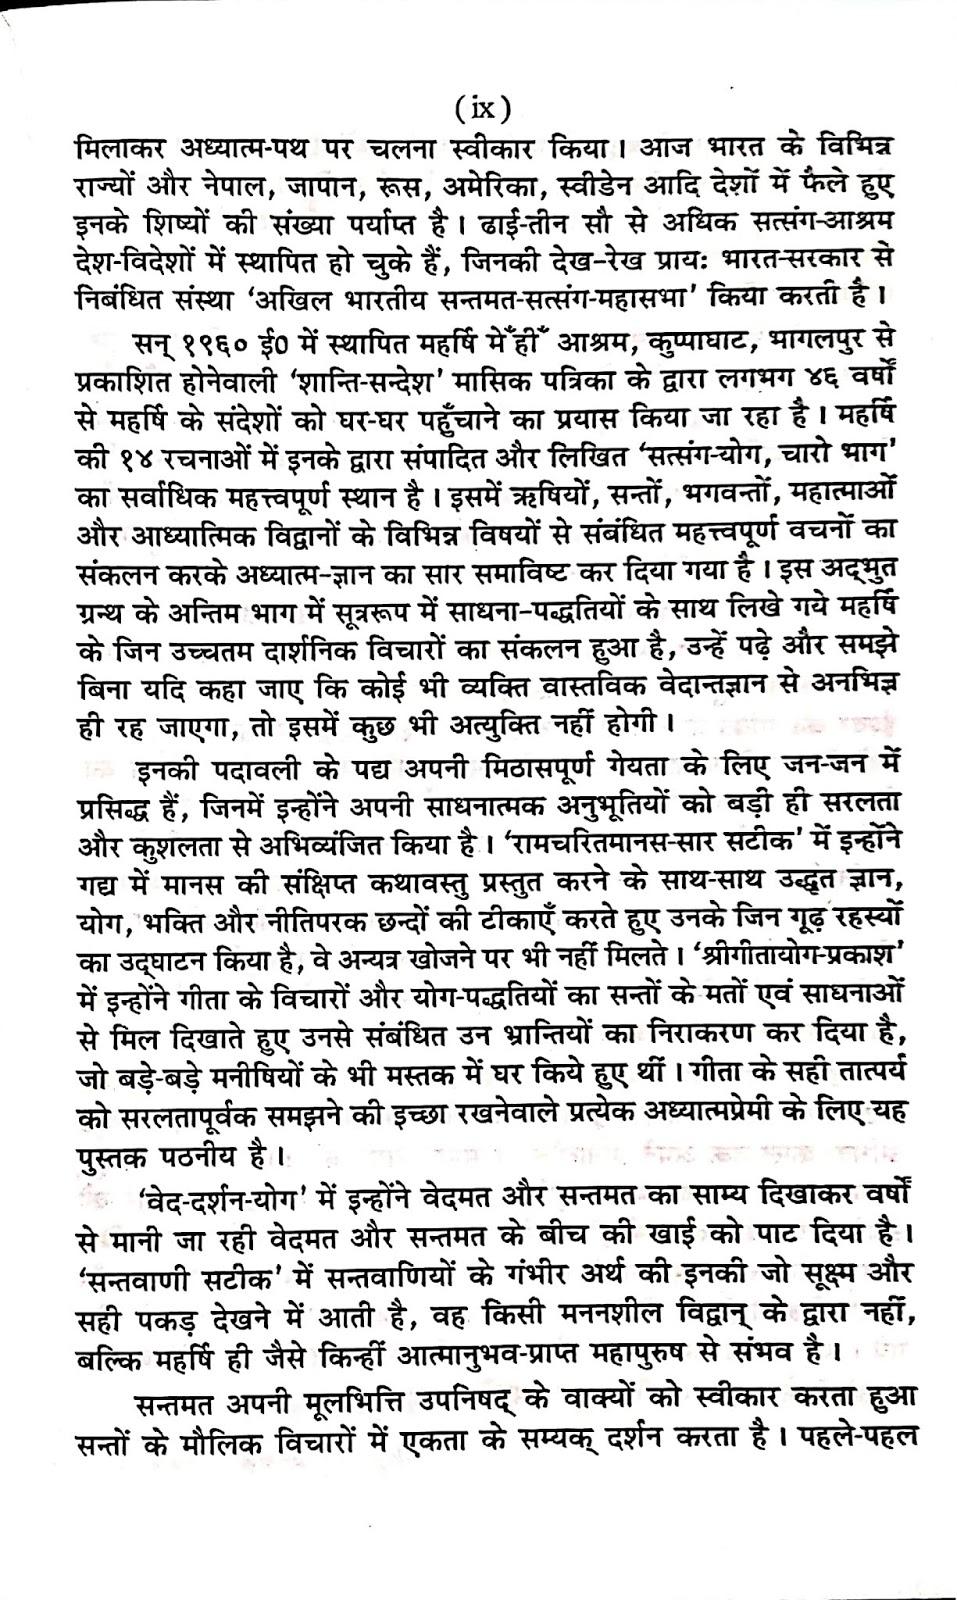 सद्गुरु महर्षि मेंहीं परमहंस जी महाराज एक परिचय Paramahansa ji is an introduction to Sadguru Maharshi। महर्षि मेंहीं परिचय चित्र 4